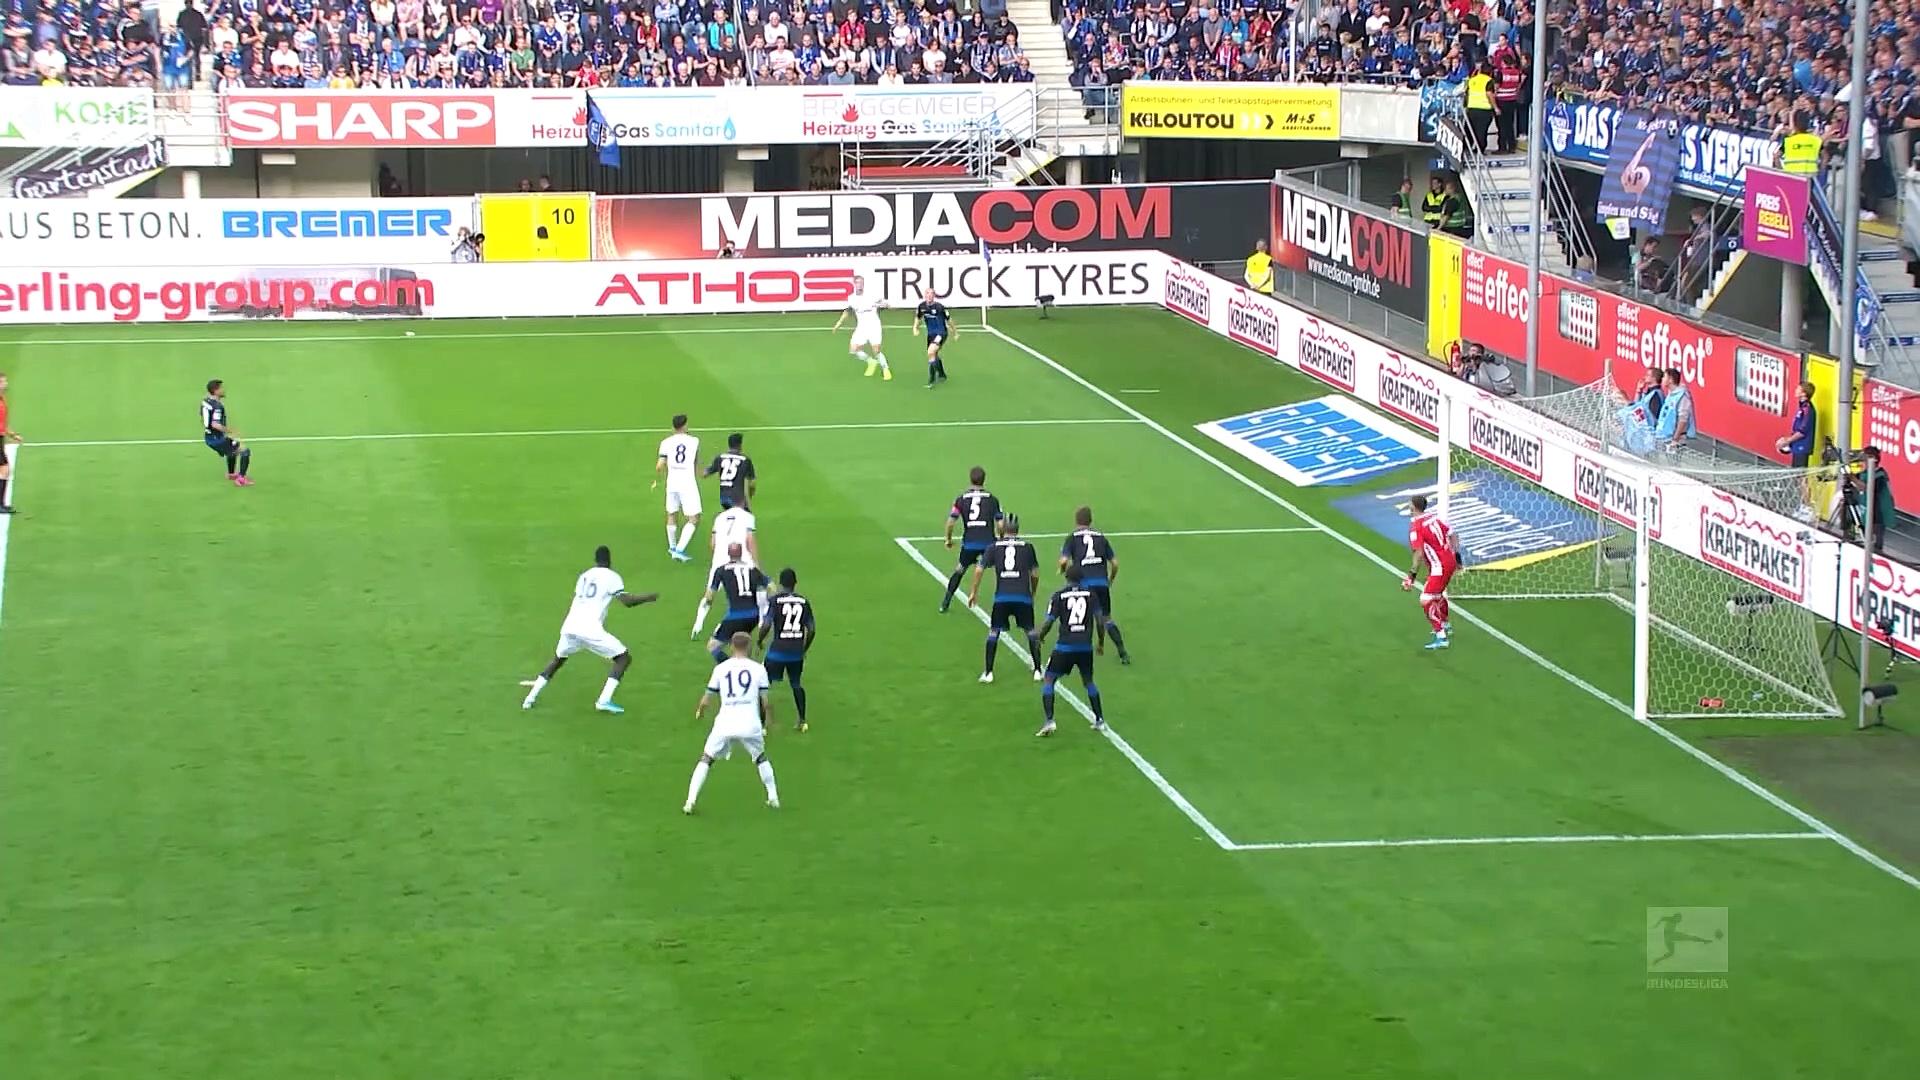 4. Hafta / Paderborn - Schalke 04: 1-5 (Özet)